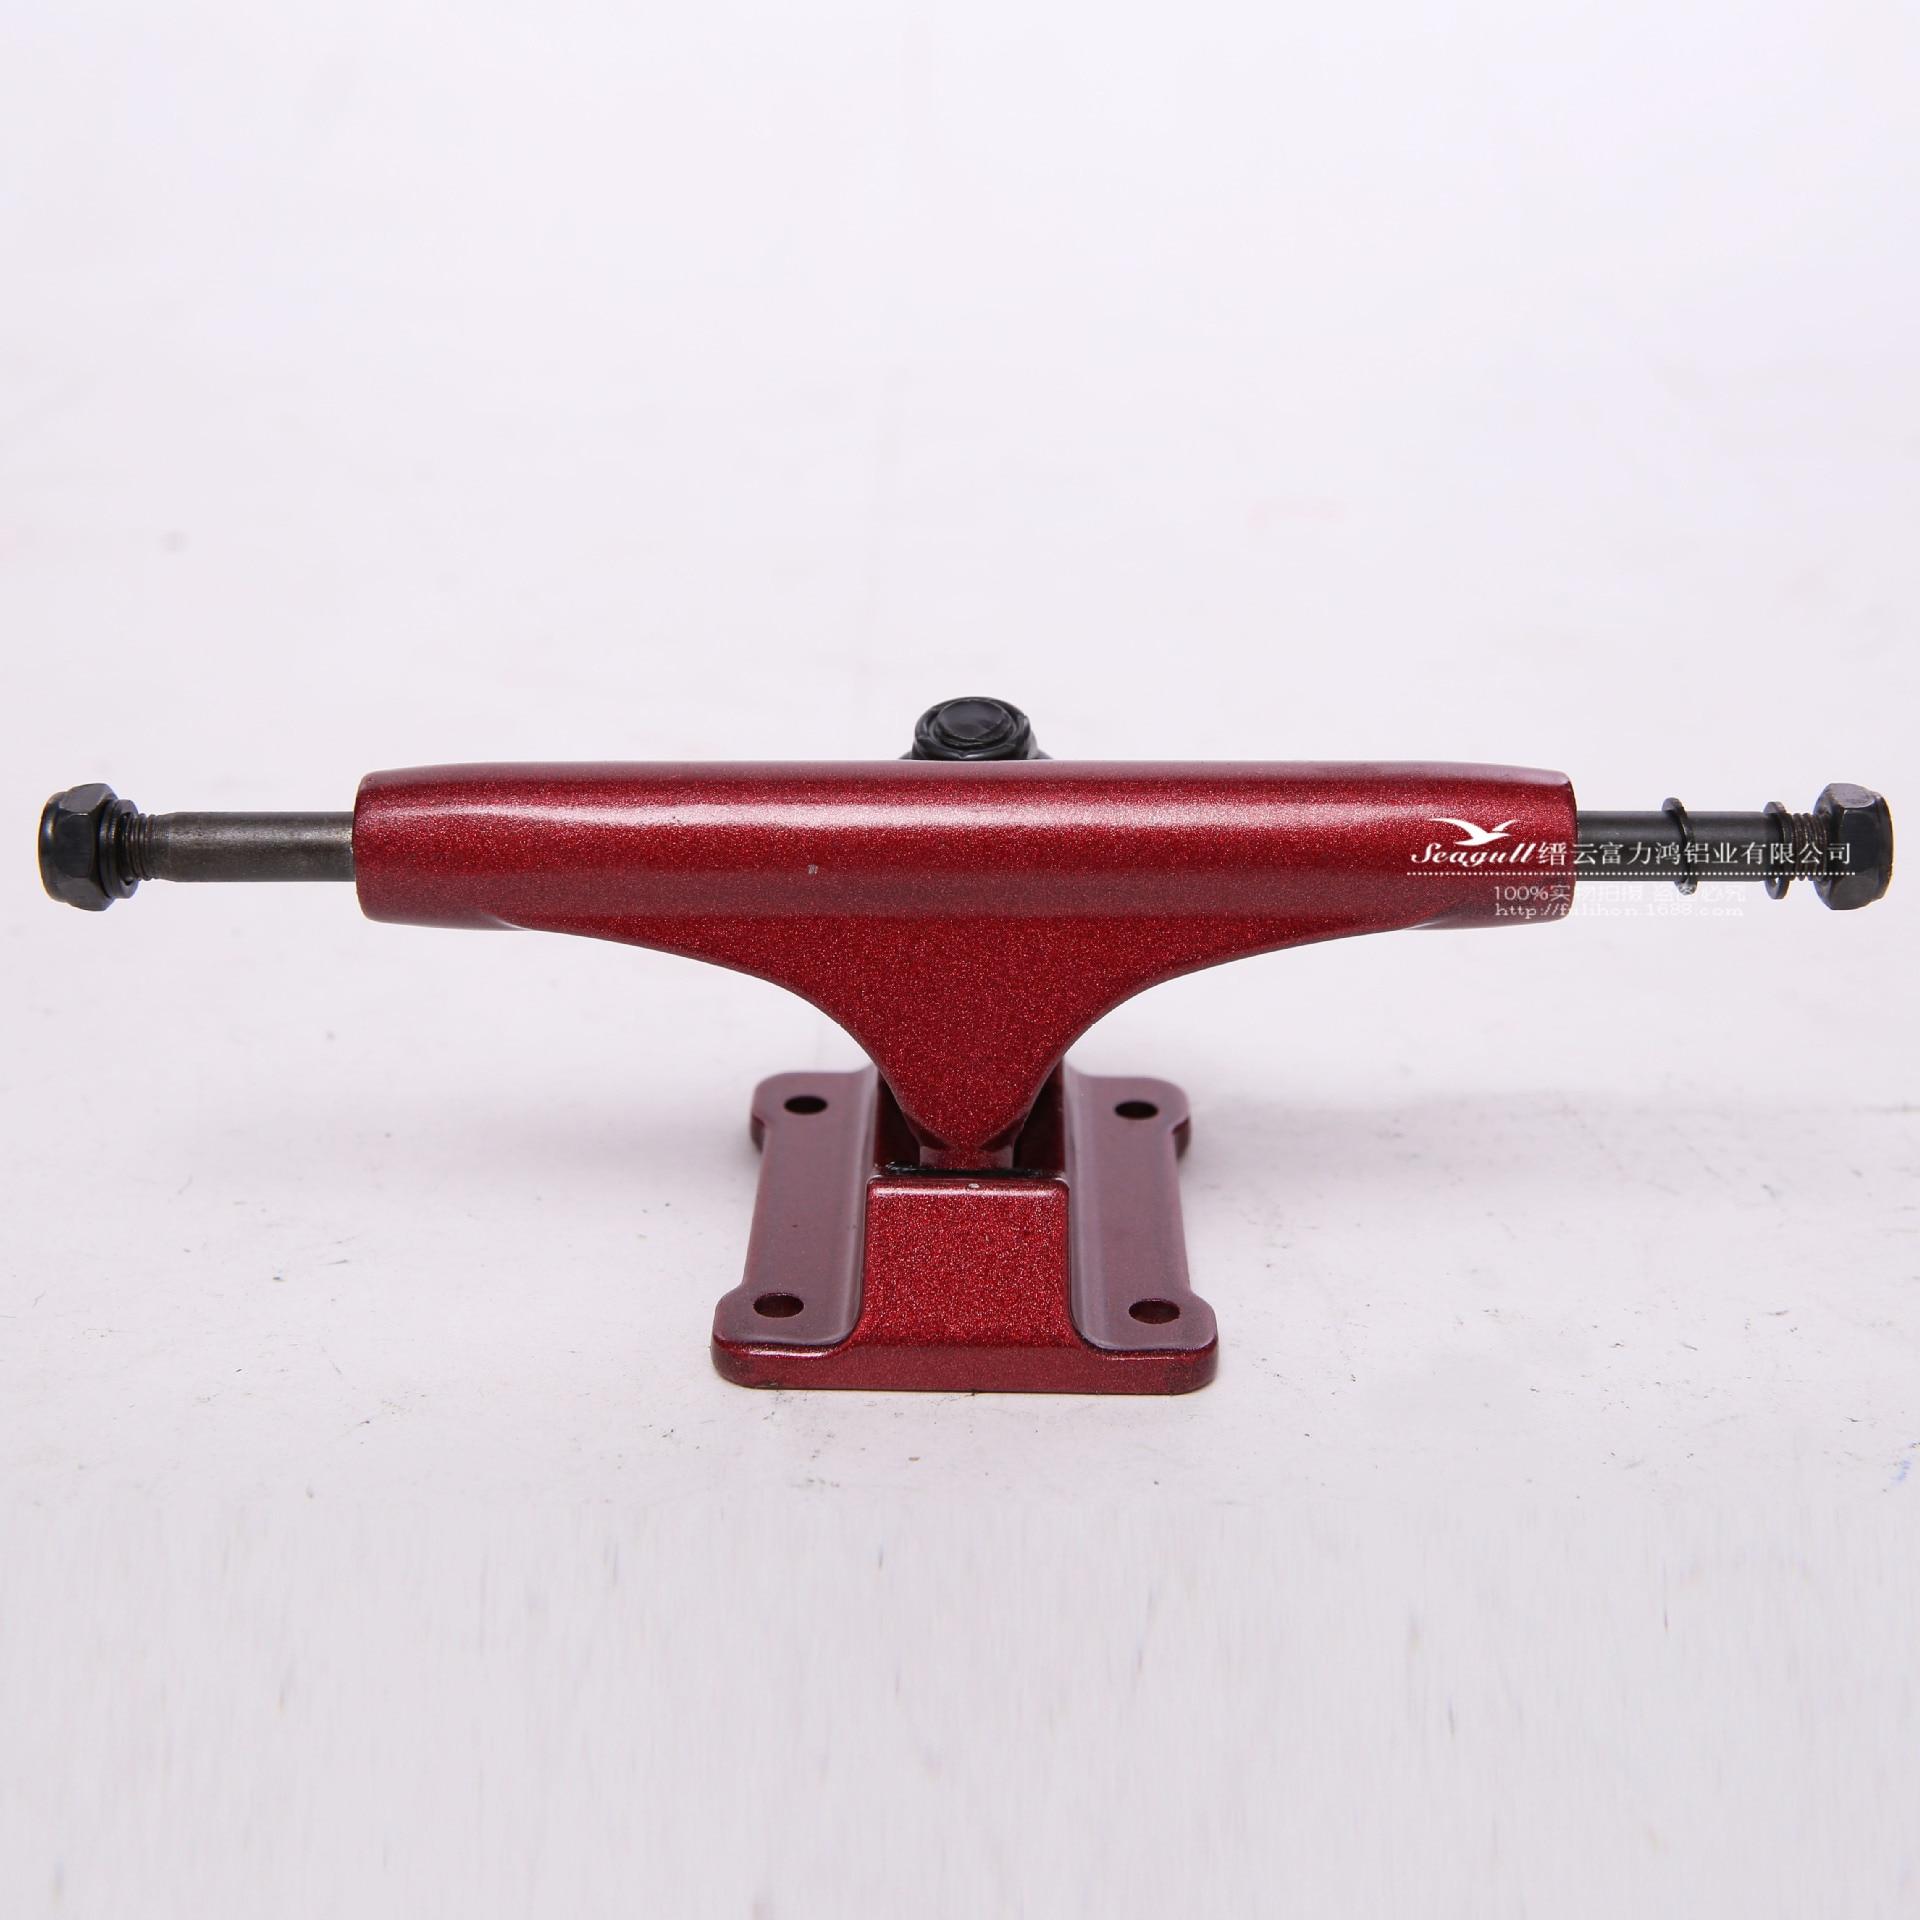 5.25 Inch 200-1 Holder (-Spray Color) Long Board Seagull Aluminum Tray/Electric Skateboard Holder